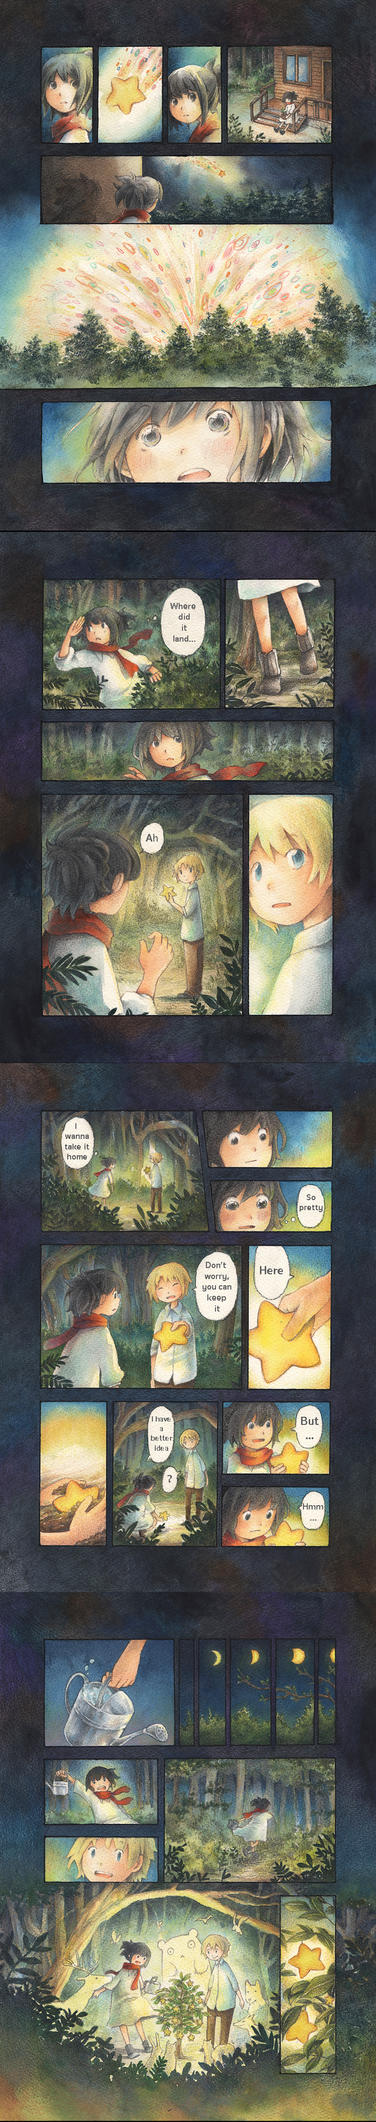 [comic] Seed of star by miimork